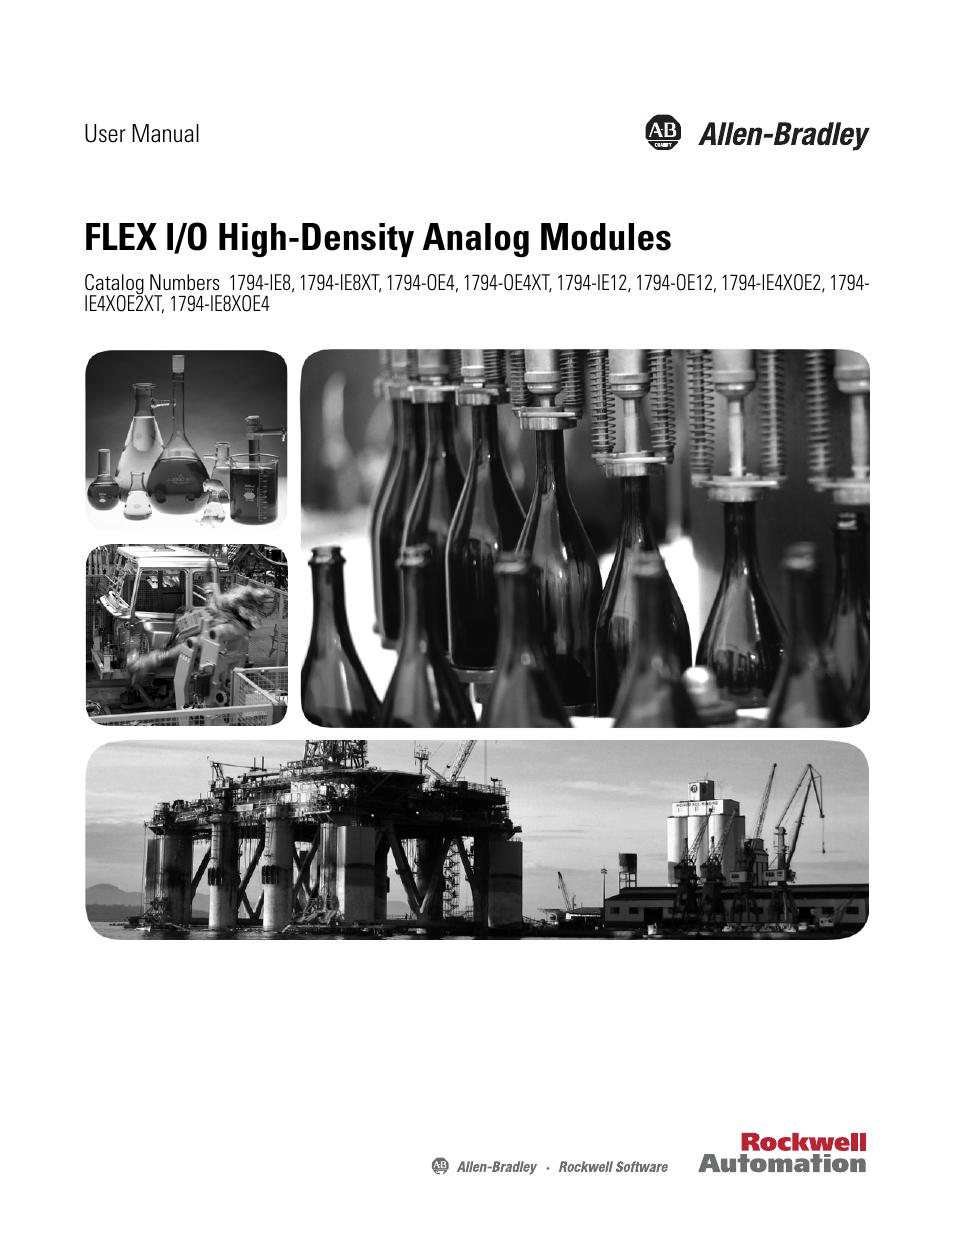 rockwell automation 1794 xxxx flex i_o high density analog modules page1 ab 1794 ie8 wiring allen bradley 1794 ie8 wiring diagram 1794 ie12 wiring diagram at creativeand.co